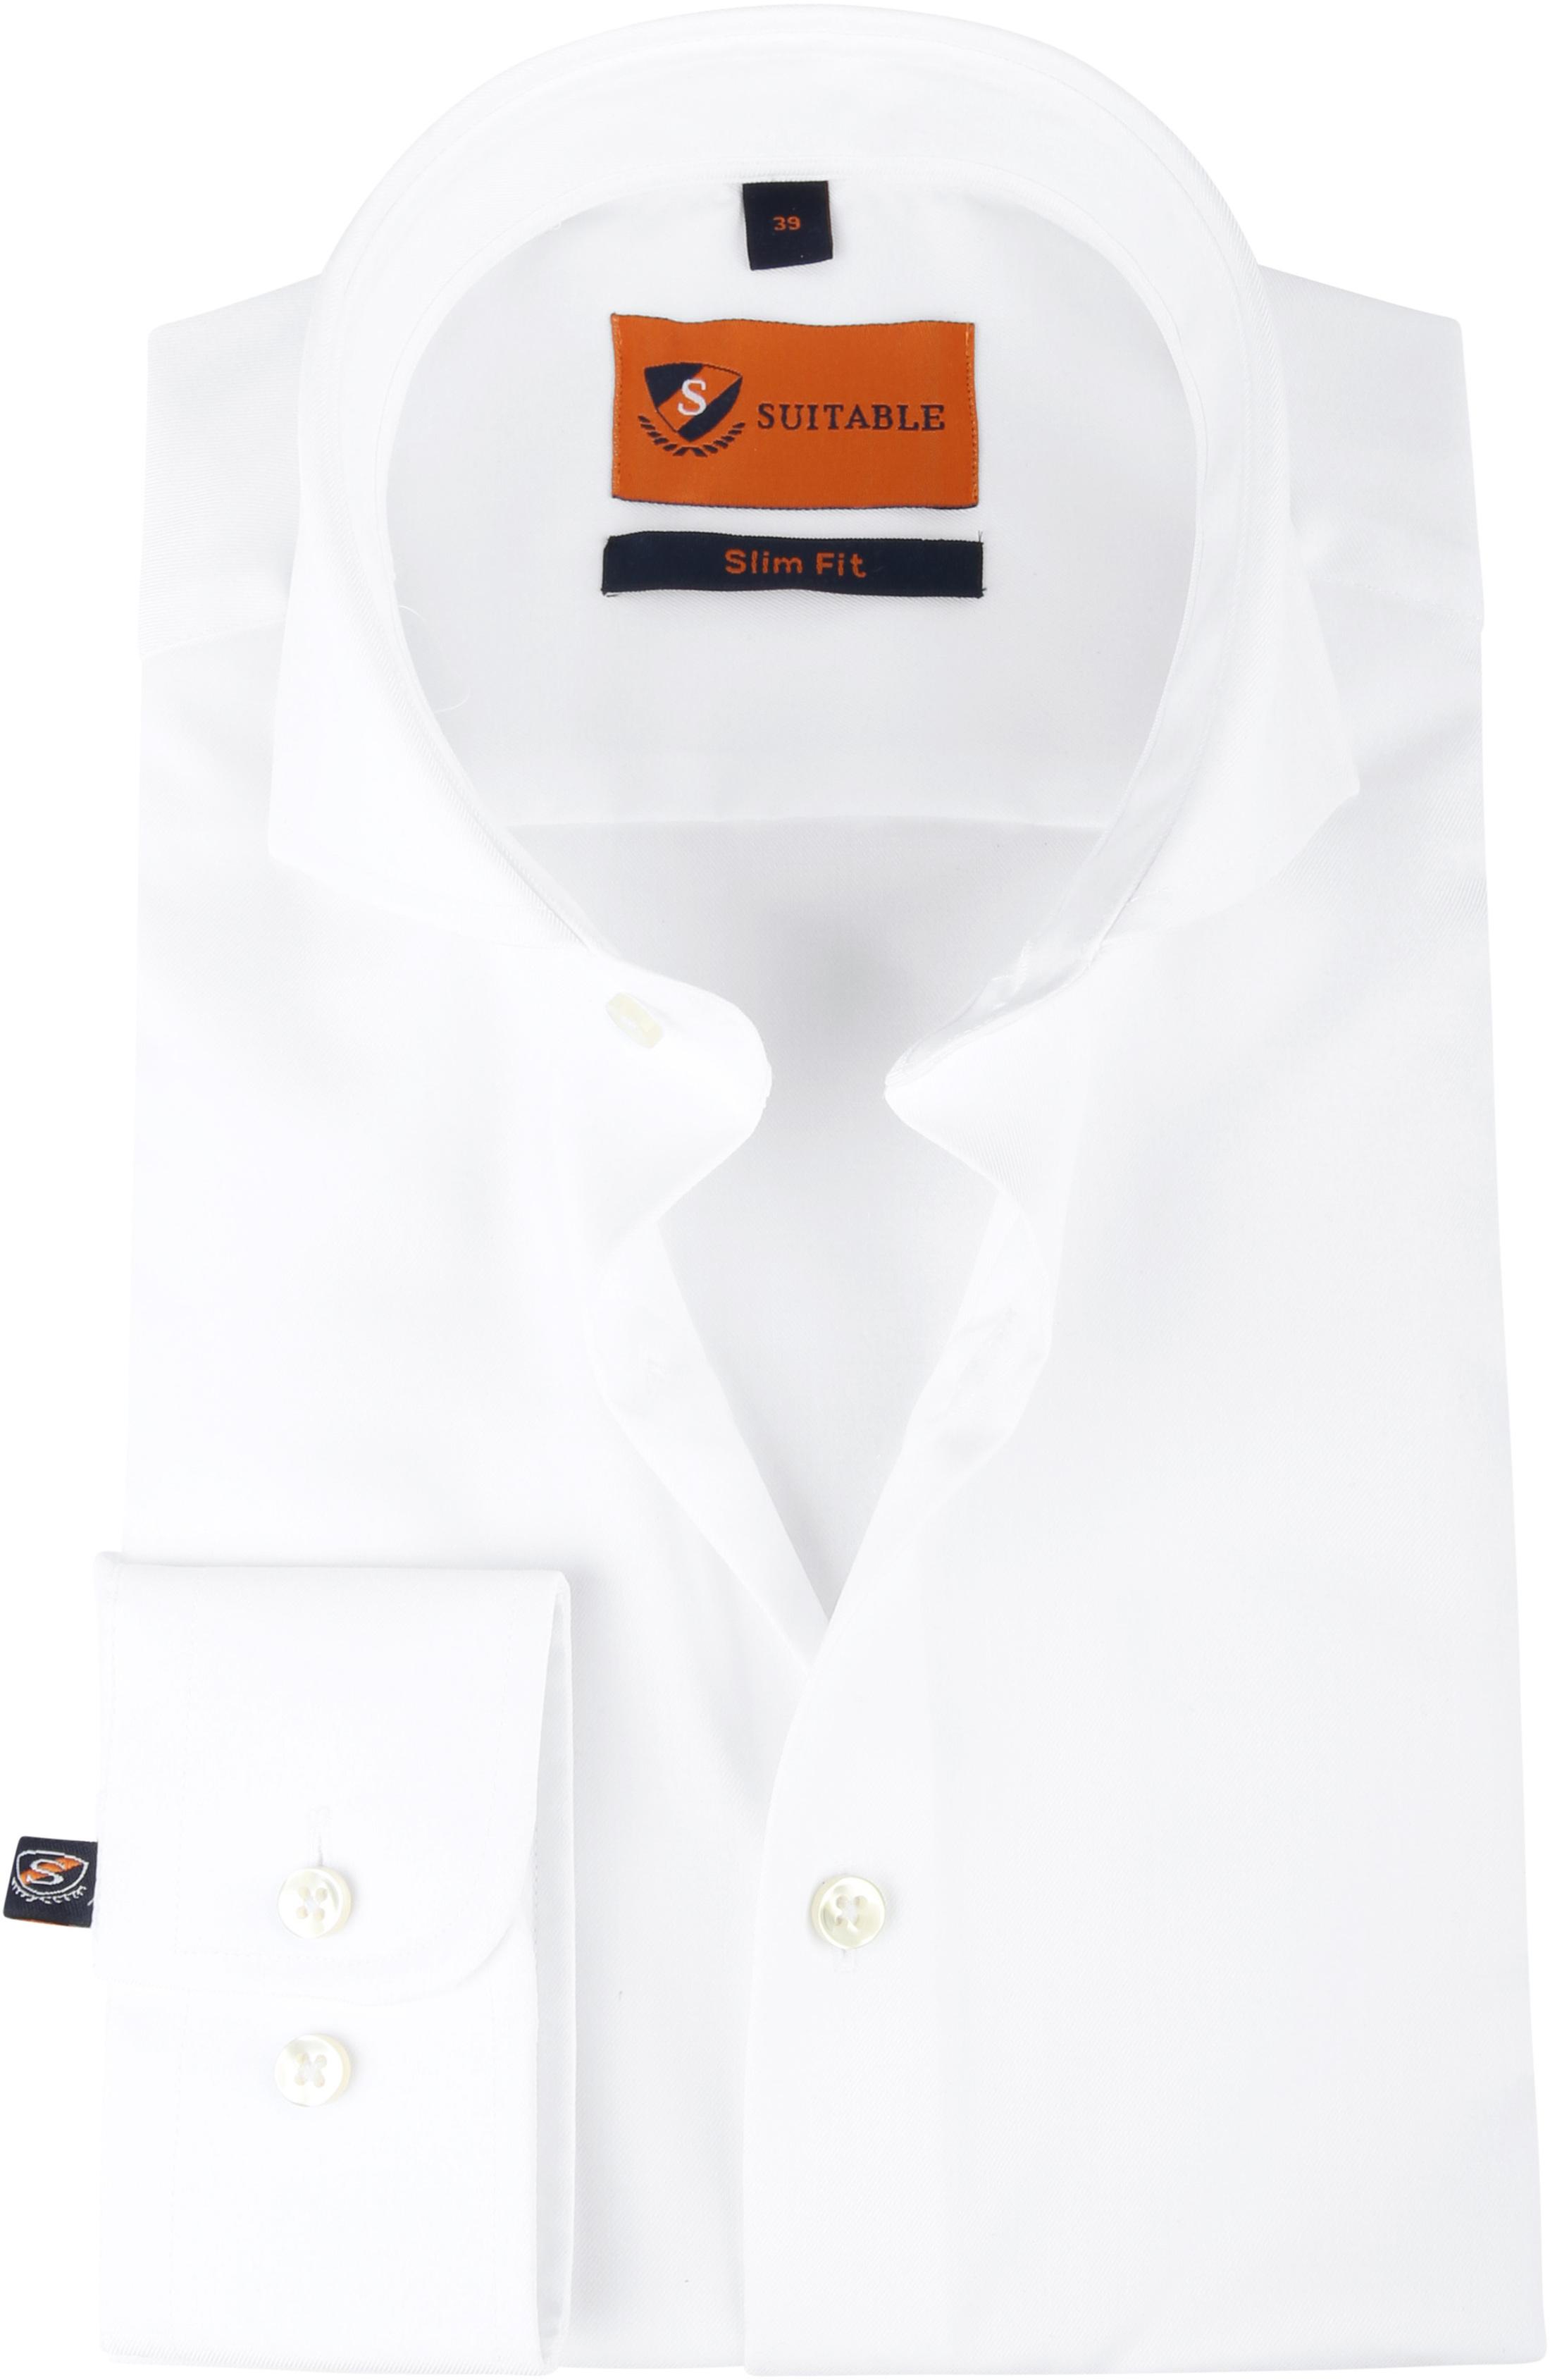 Suitable Overhemd Wit 146-7 foto 0